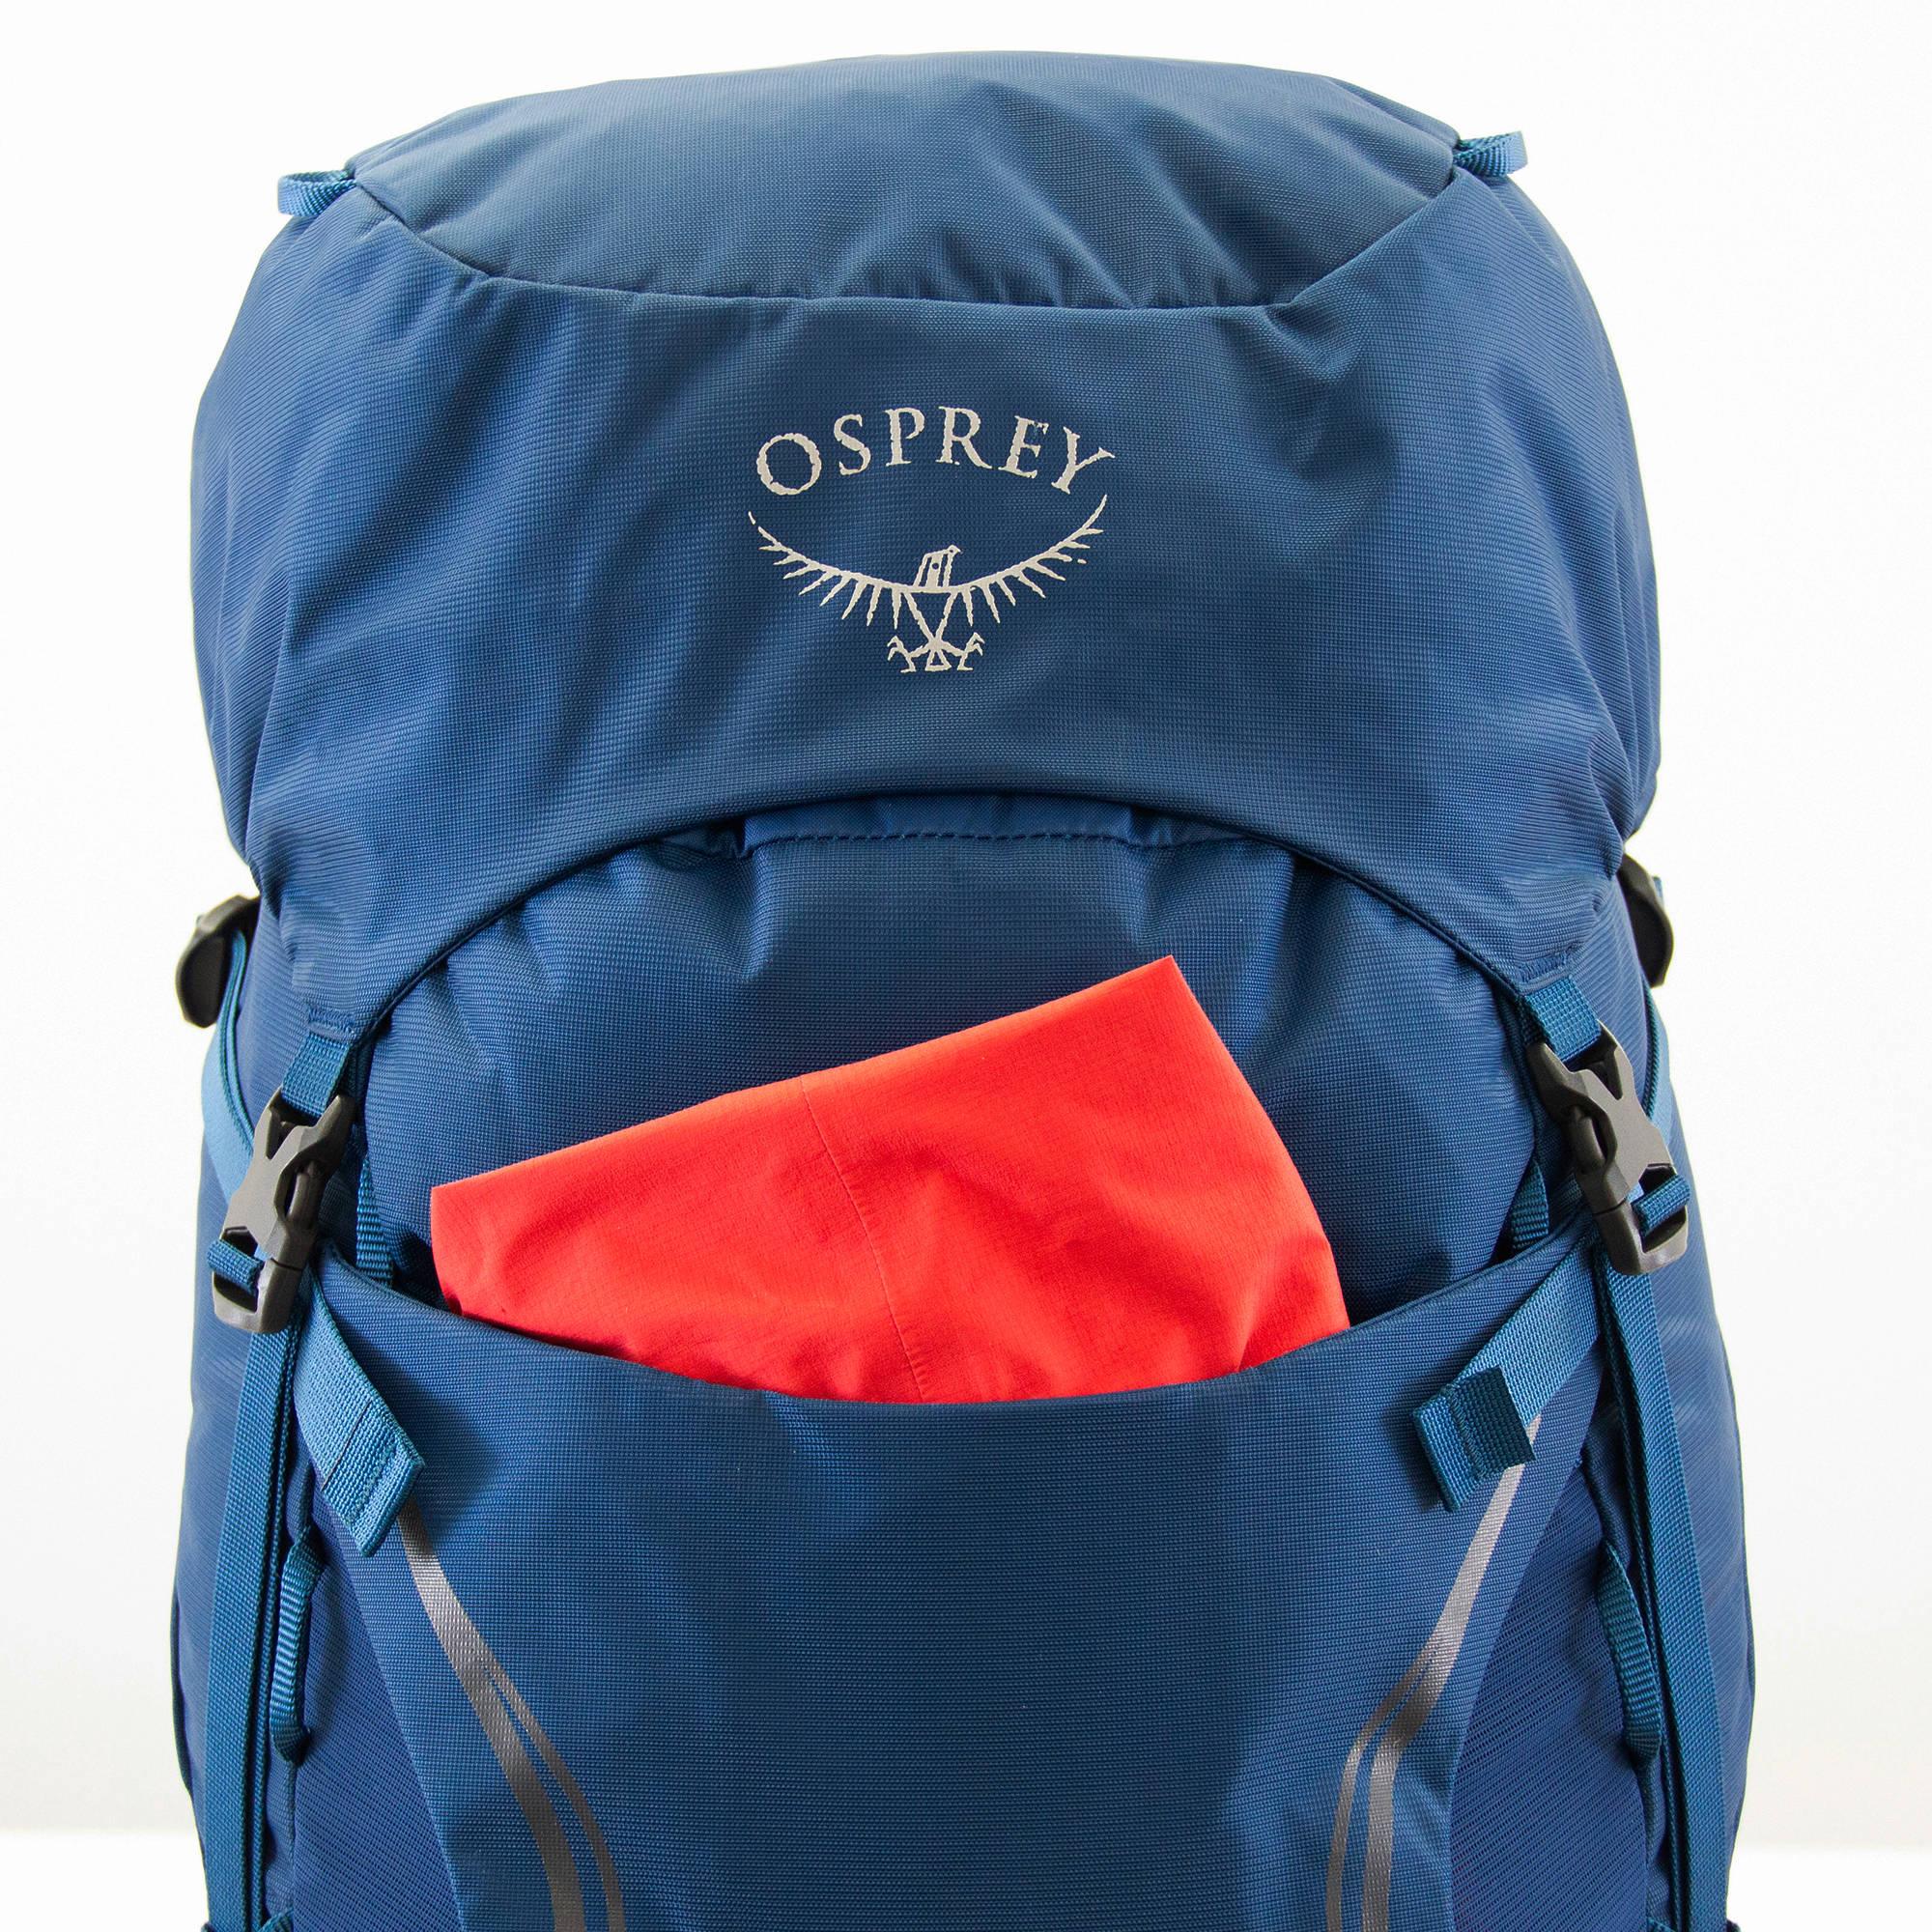 Osprey Kestrel 58 Liter